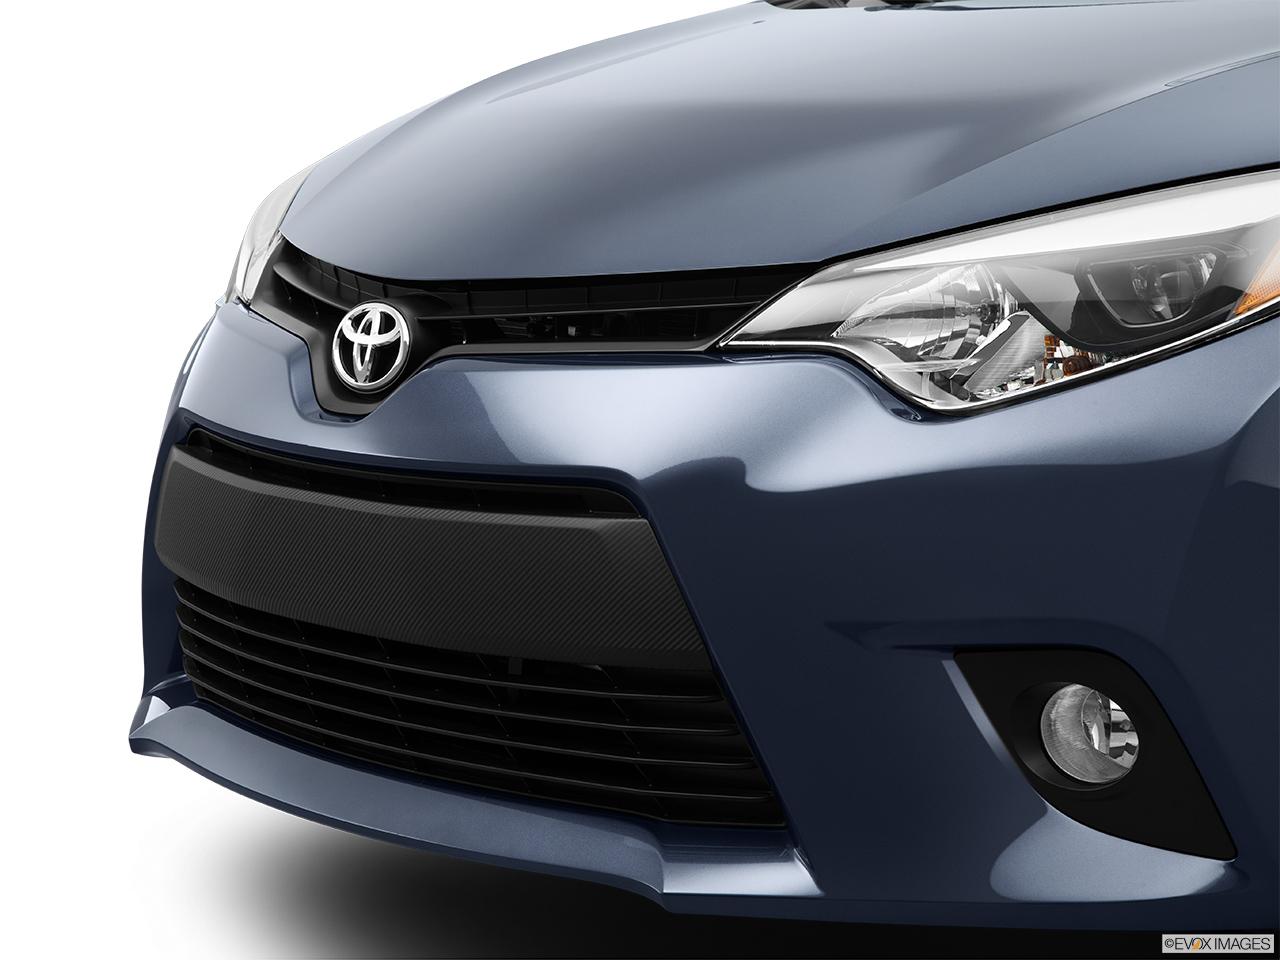 2015 Toyota Corolla 4dr Sedan Cvt Le Close Up Of Grill